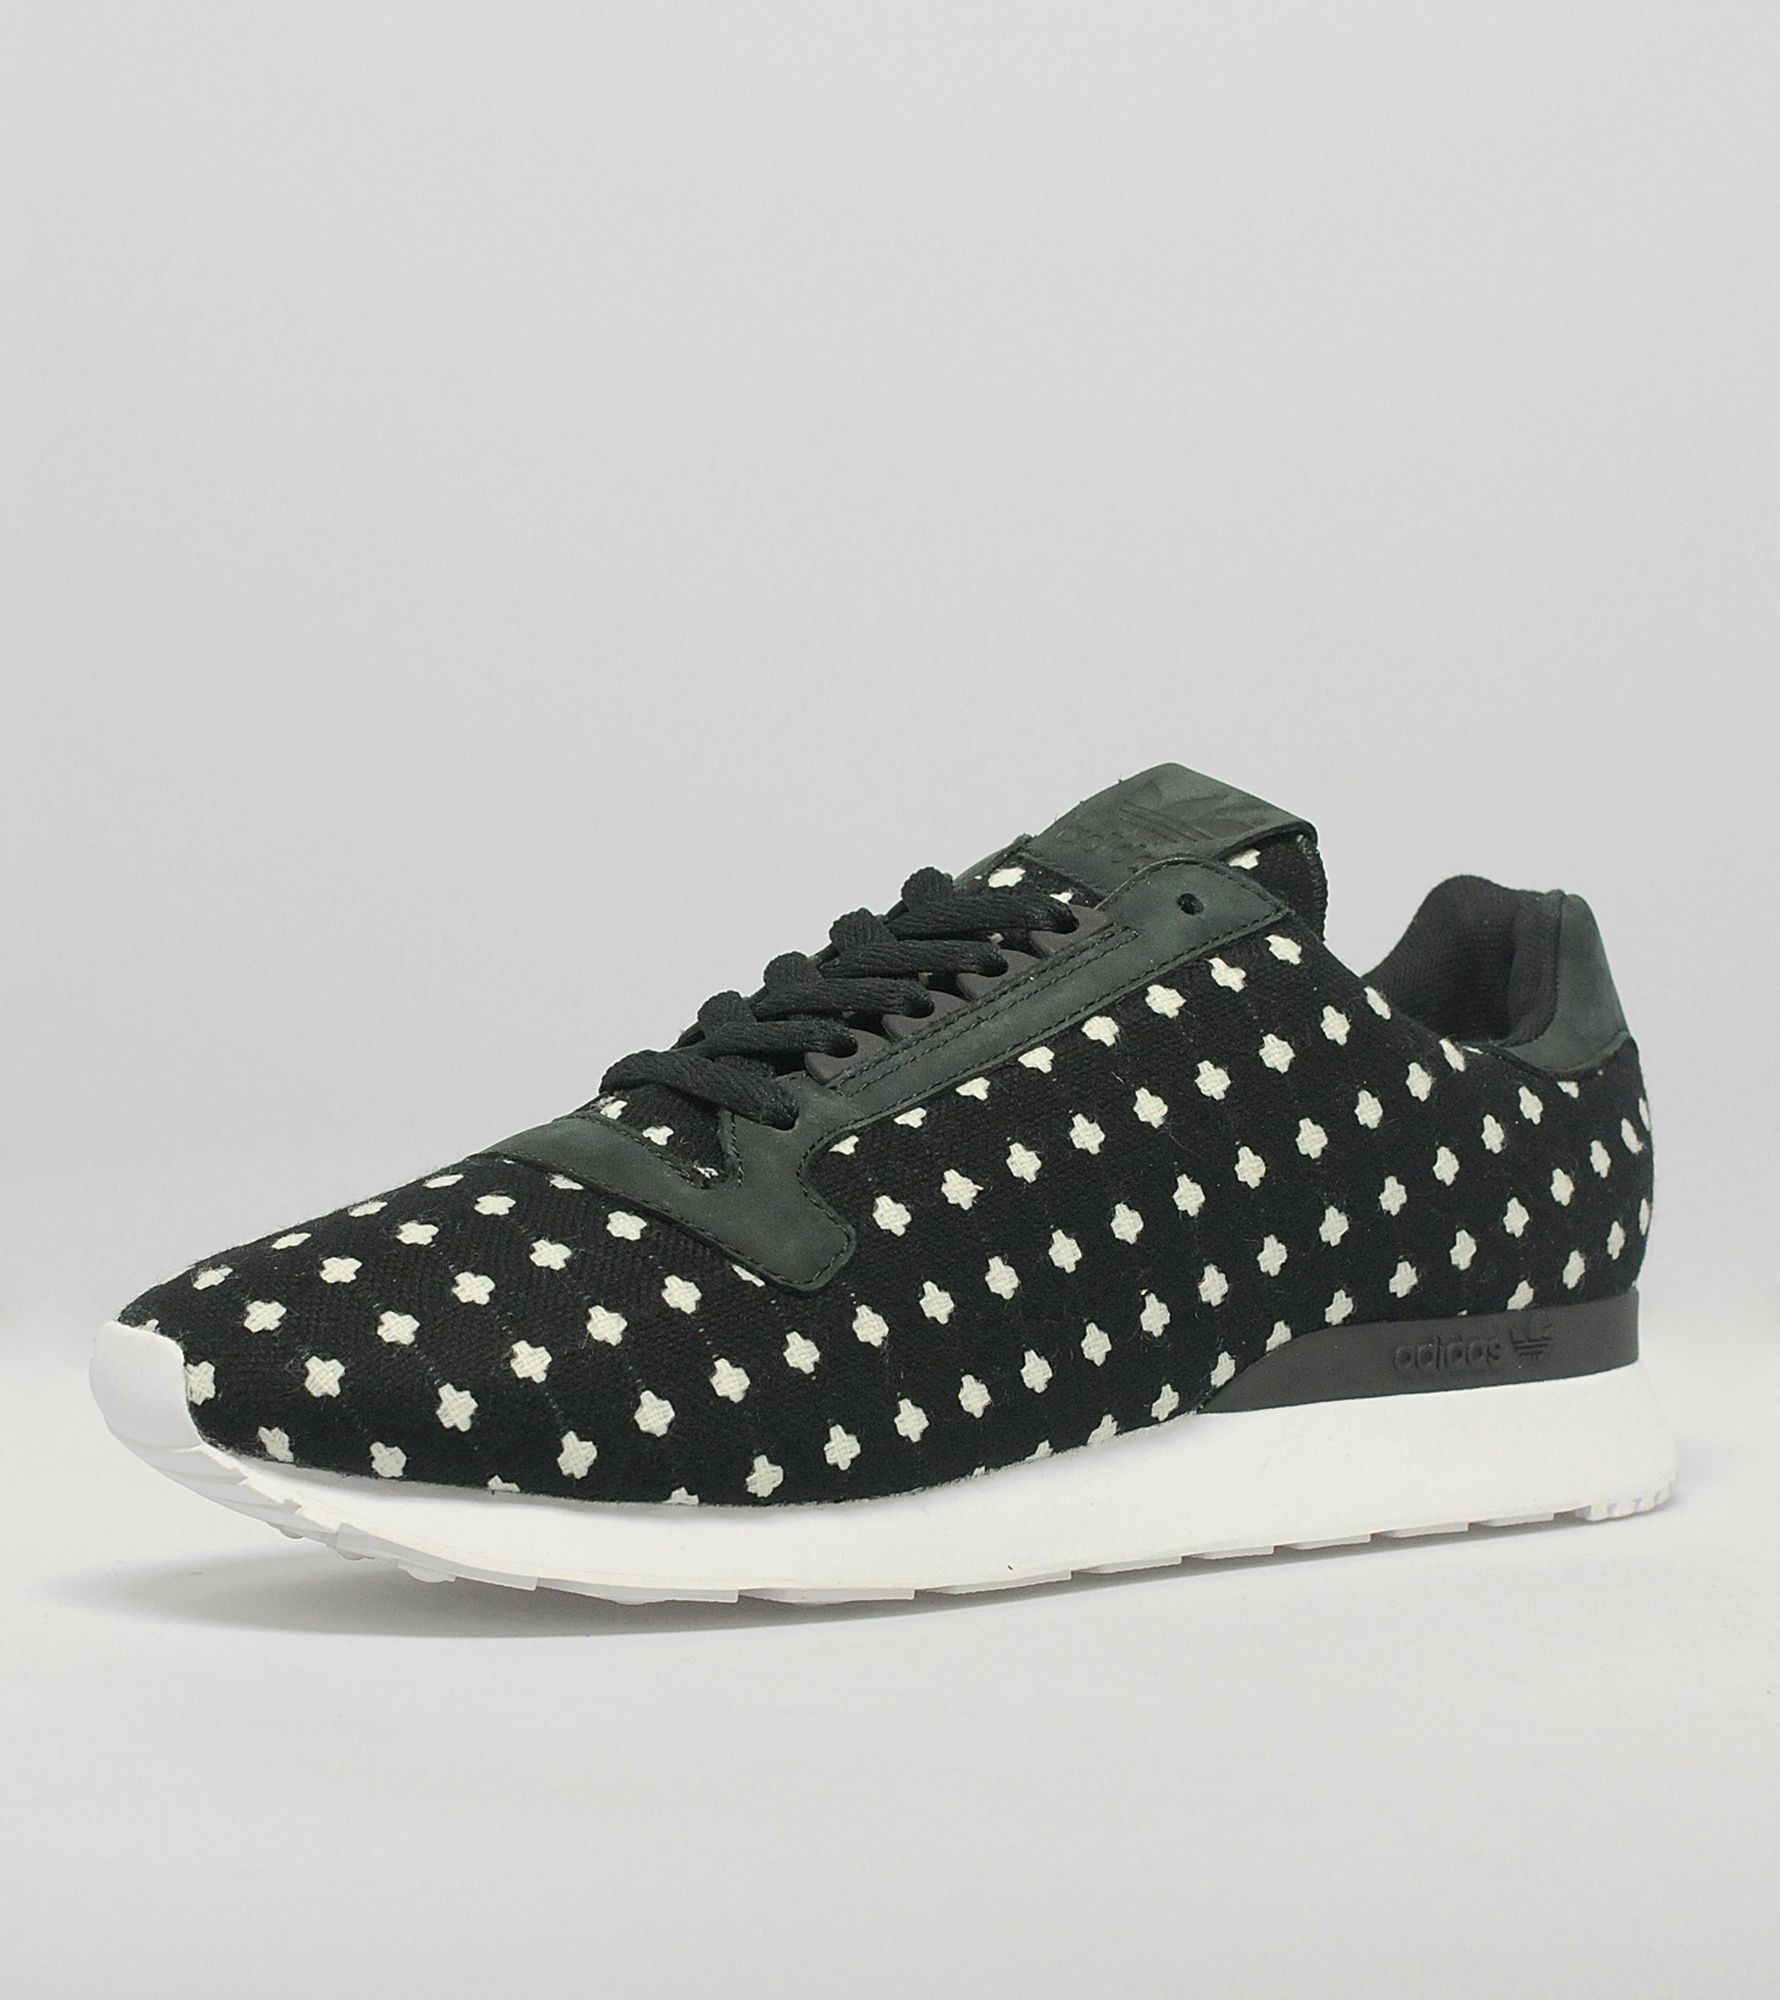 043f804c8 ... Sneaker Freaker adidas Originals ZX 500 Cross Knit - size exclusive  Size ...